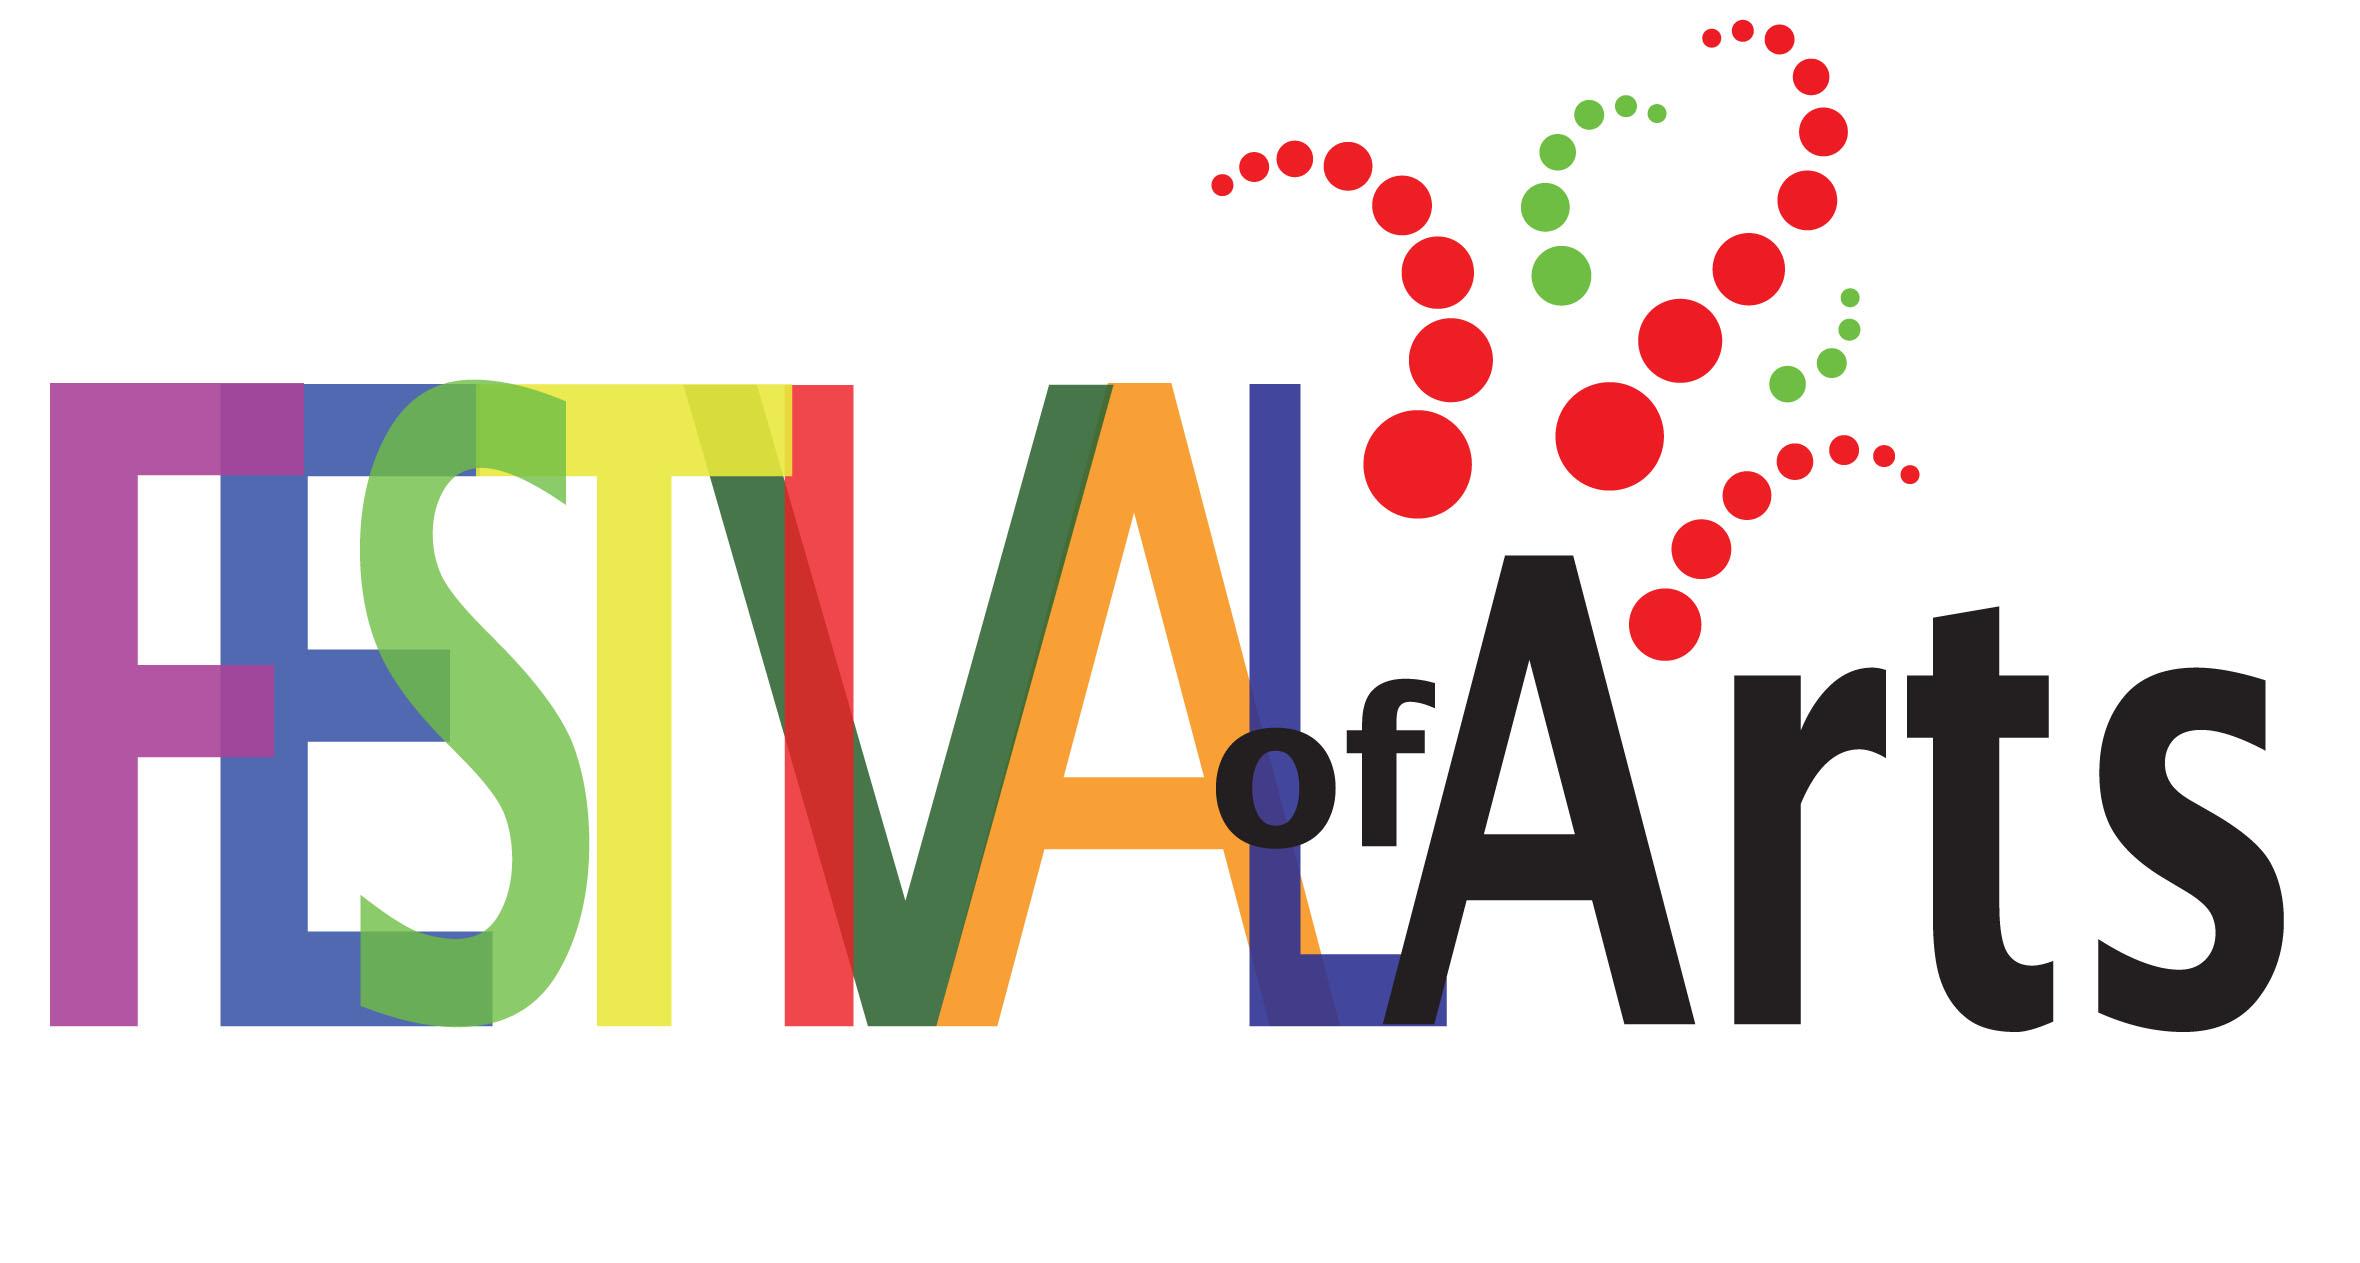 Art festival clipart picture black and white download Free Festival Cliparts, Download Free Clip Art, Free Clip Art on ... picture black and white download